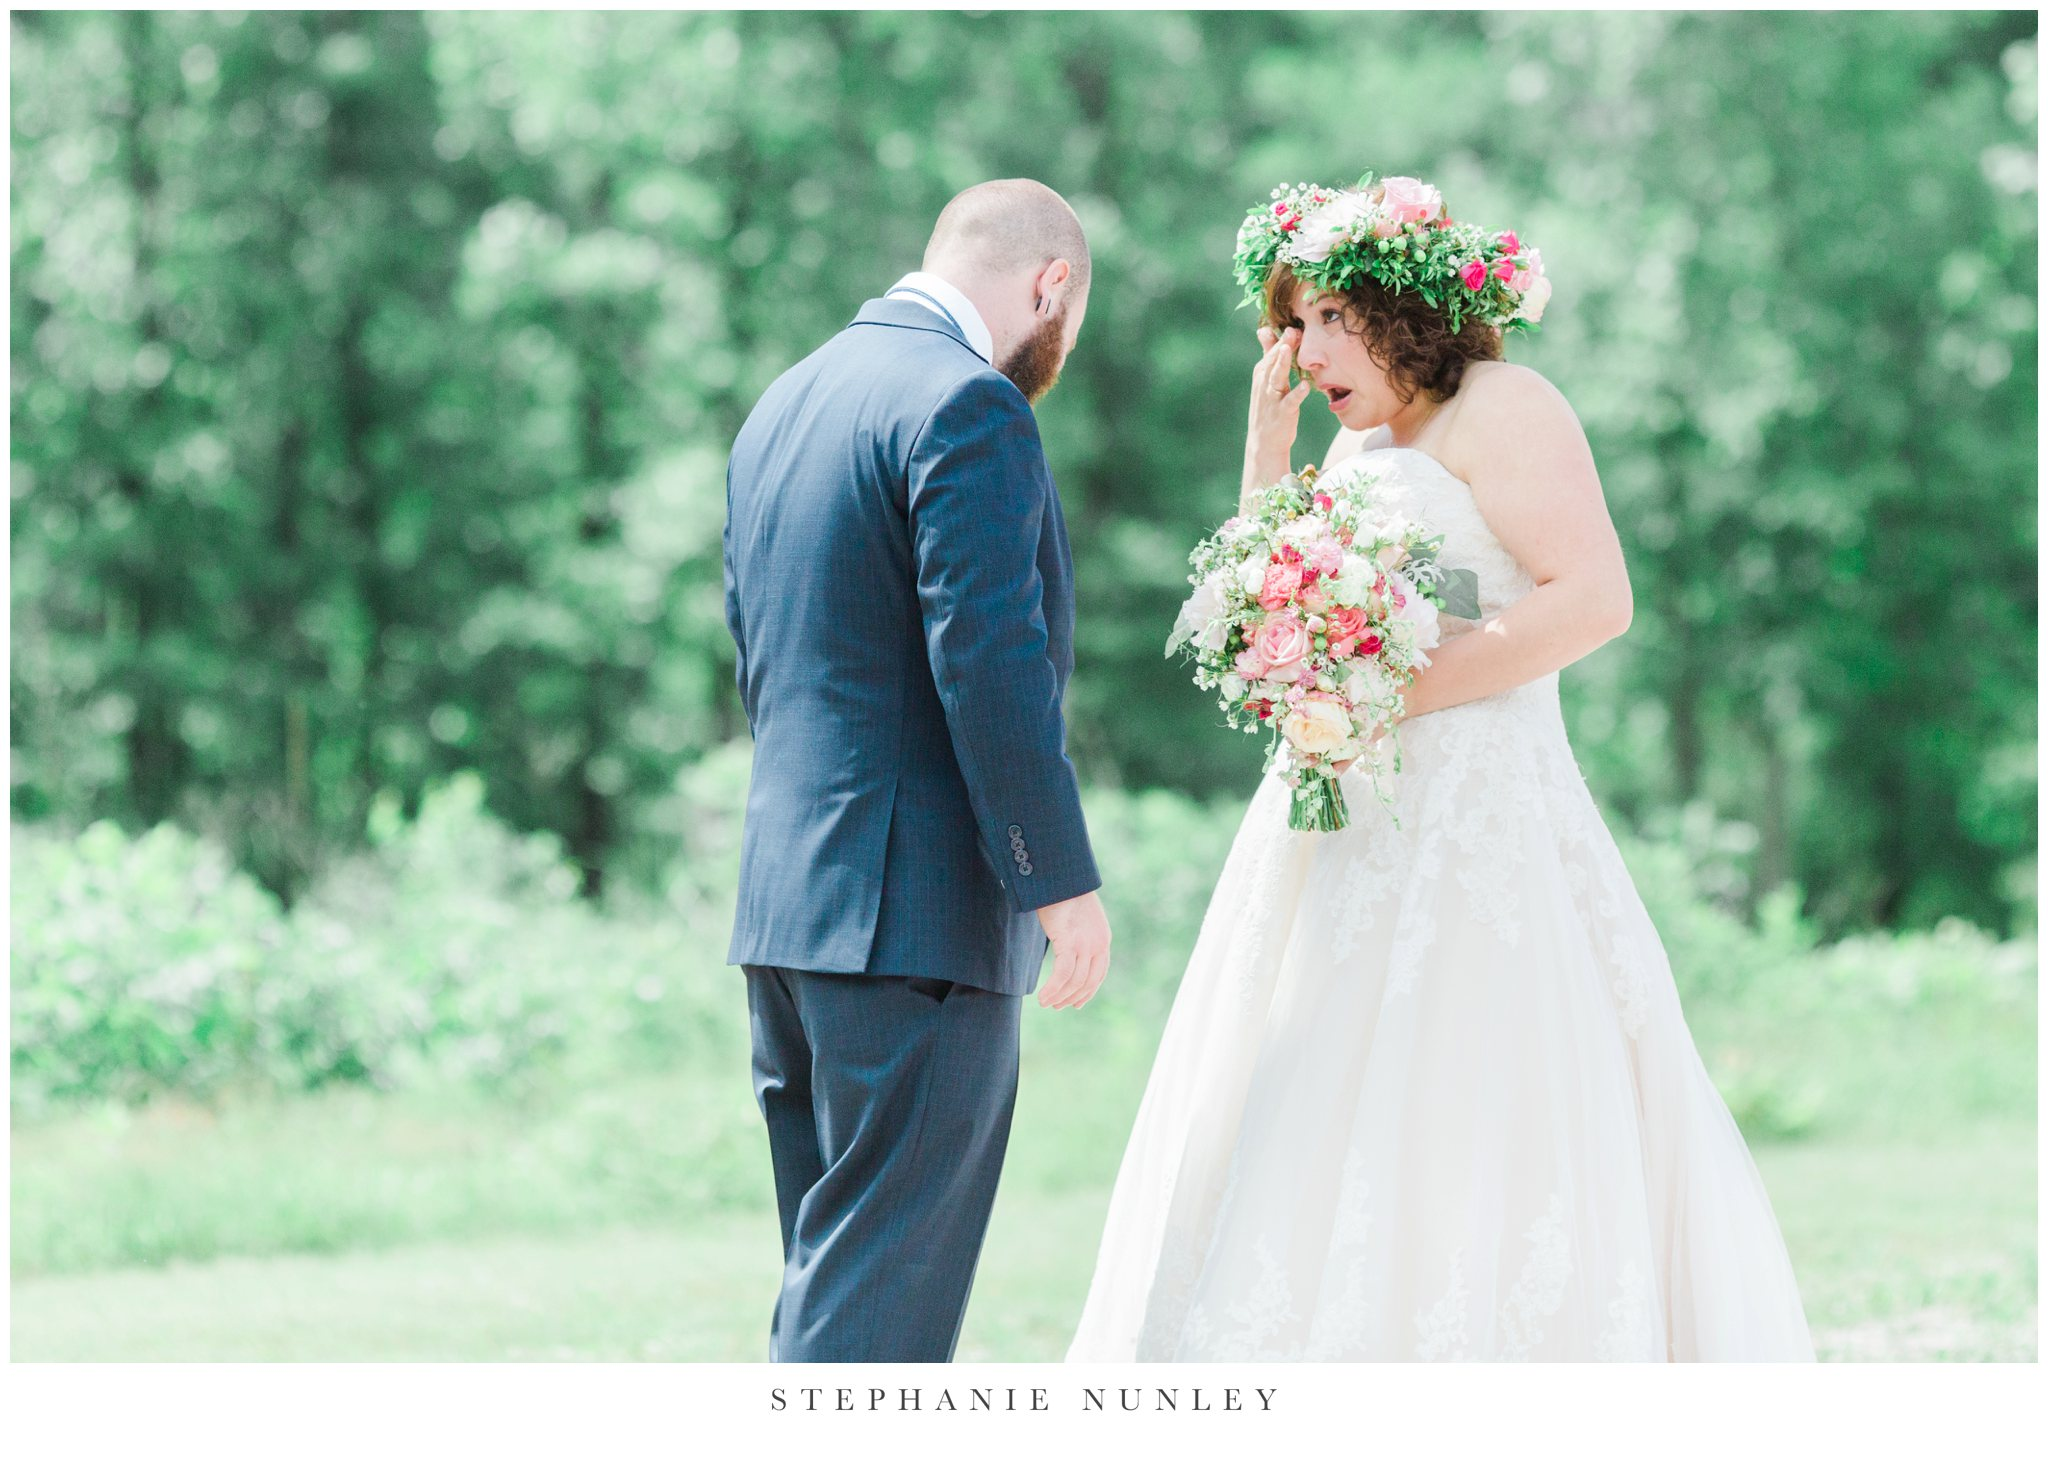 romantic-outdoor-wedding-with-flower-crown-0031.jpg